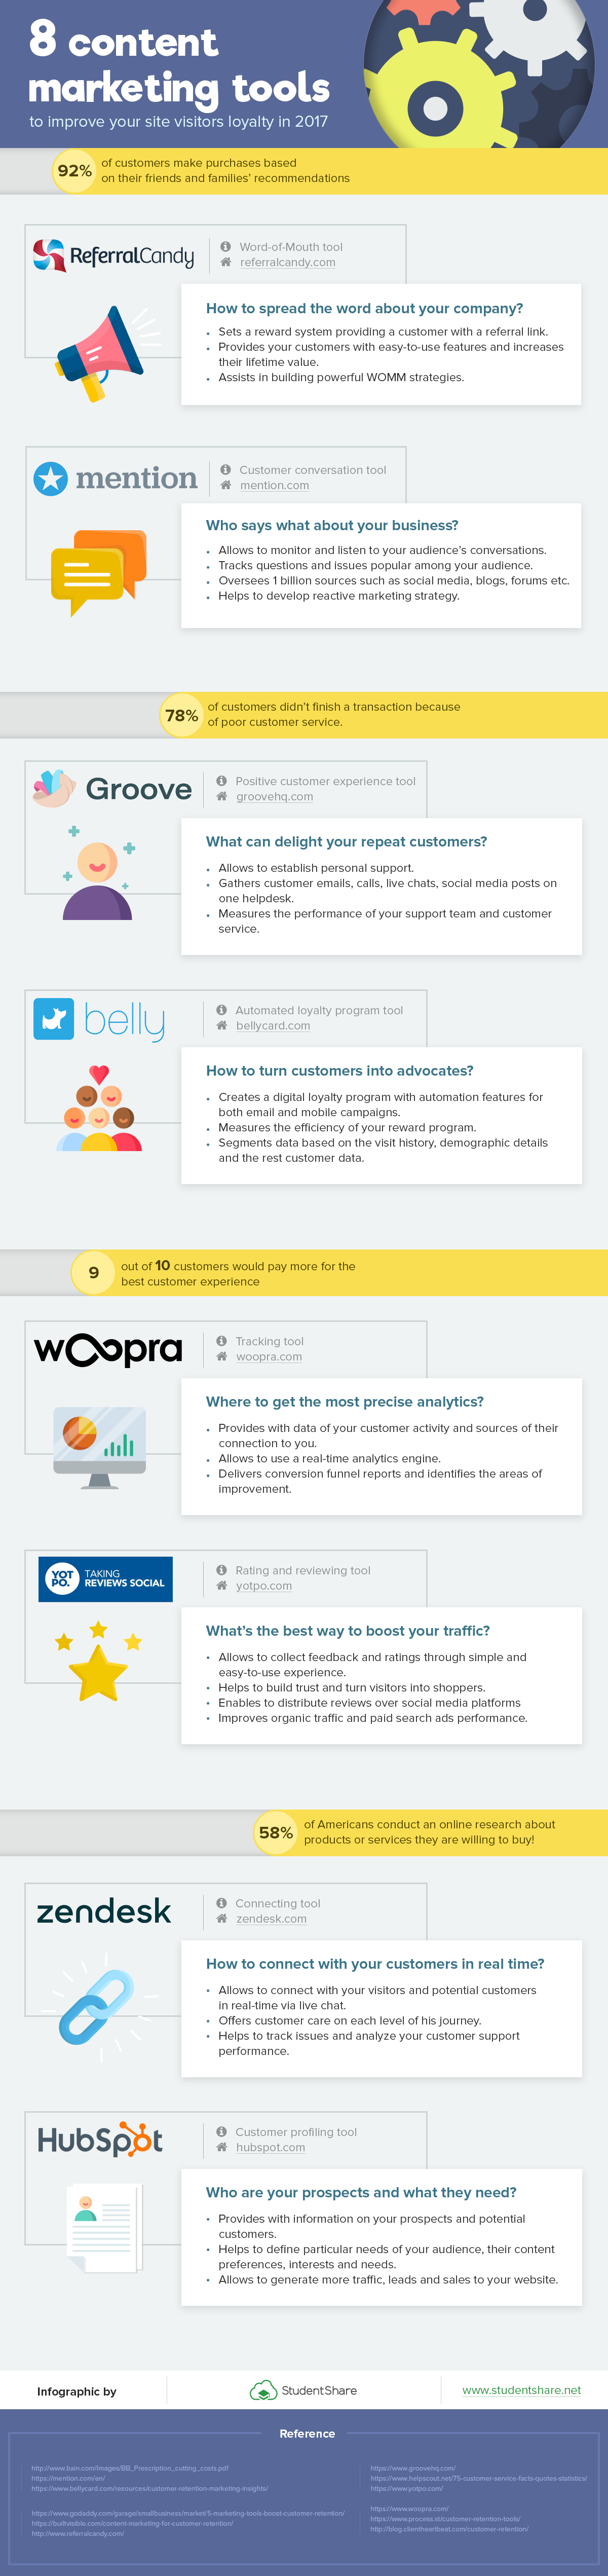 8 Content Marketing Tools to Improve Retention [Infographic]